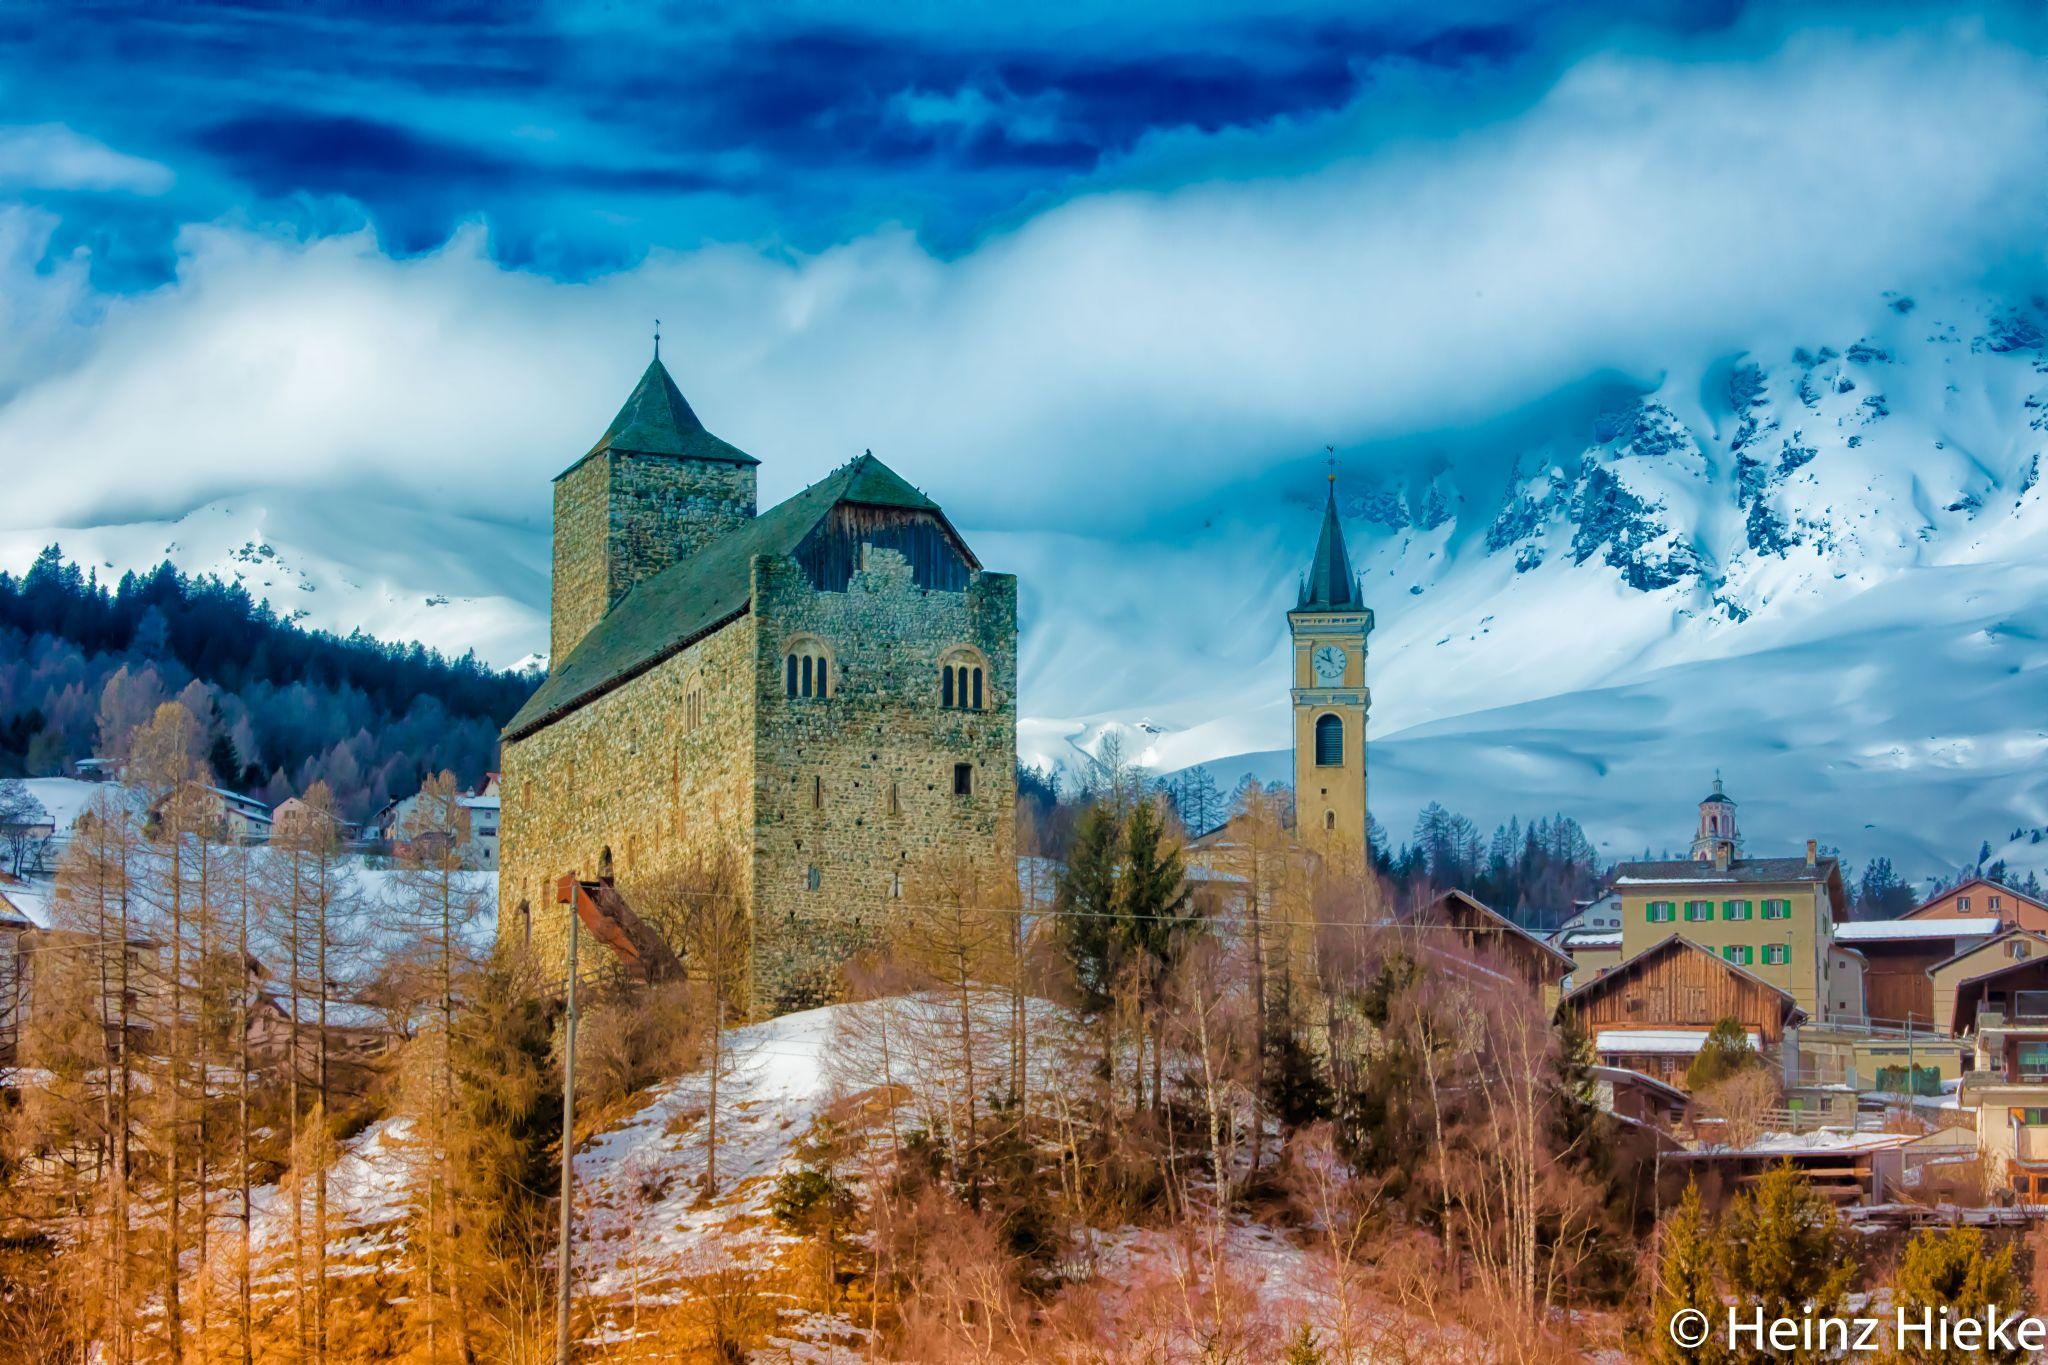 Burg Riom, Switzerland